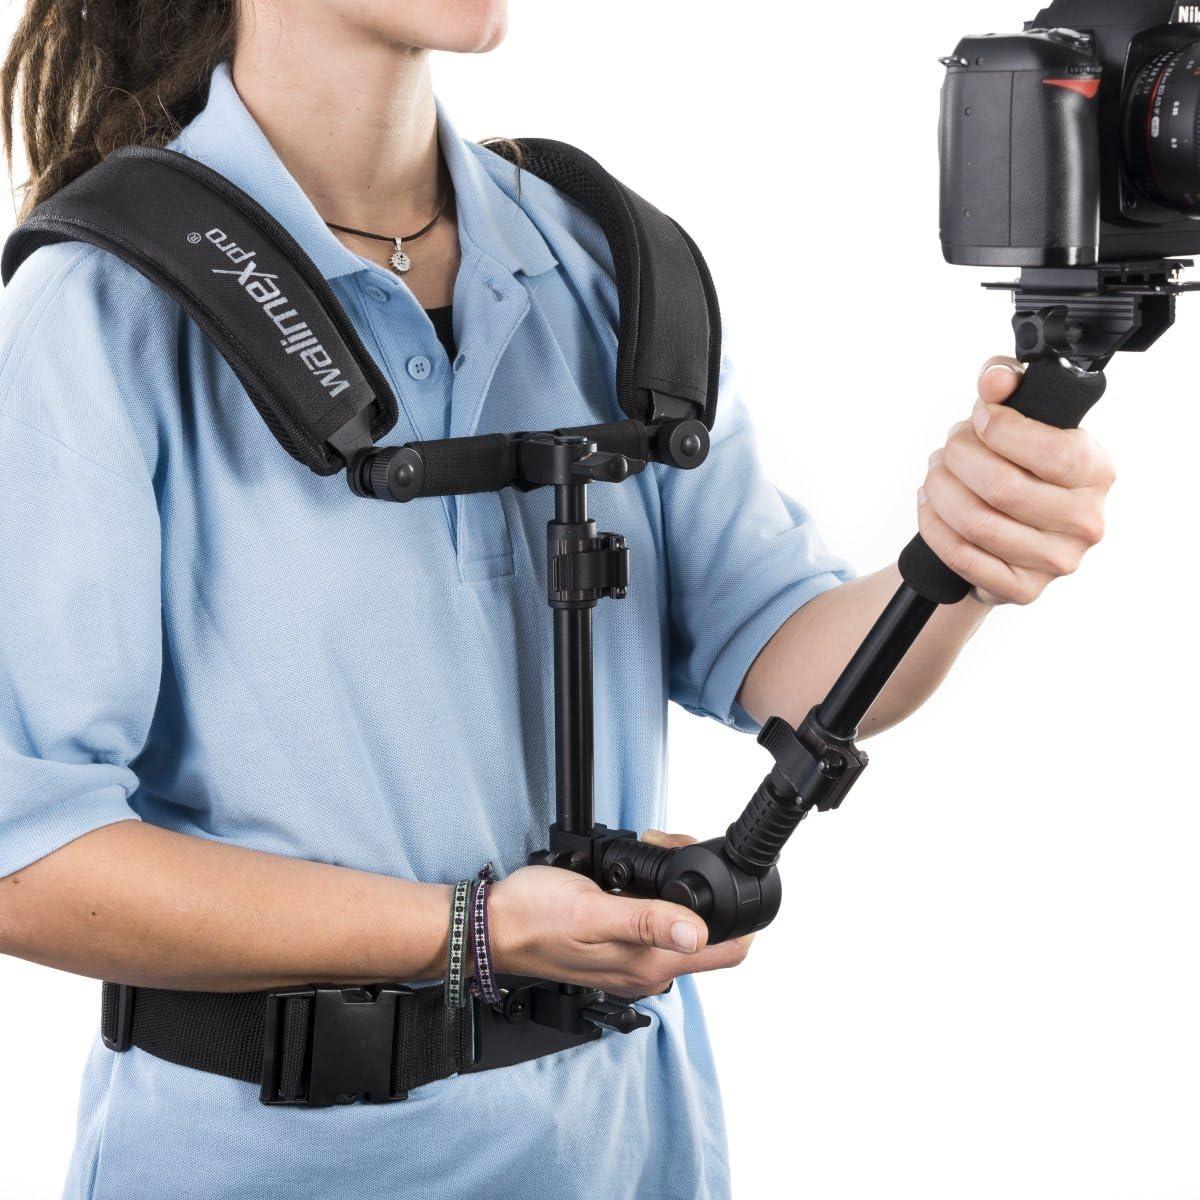 Walimex Pro Video Schulterstativ Auslegearm, Schnellwechselplatte, Bauchgurt, Follow-Fokus-Ring